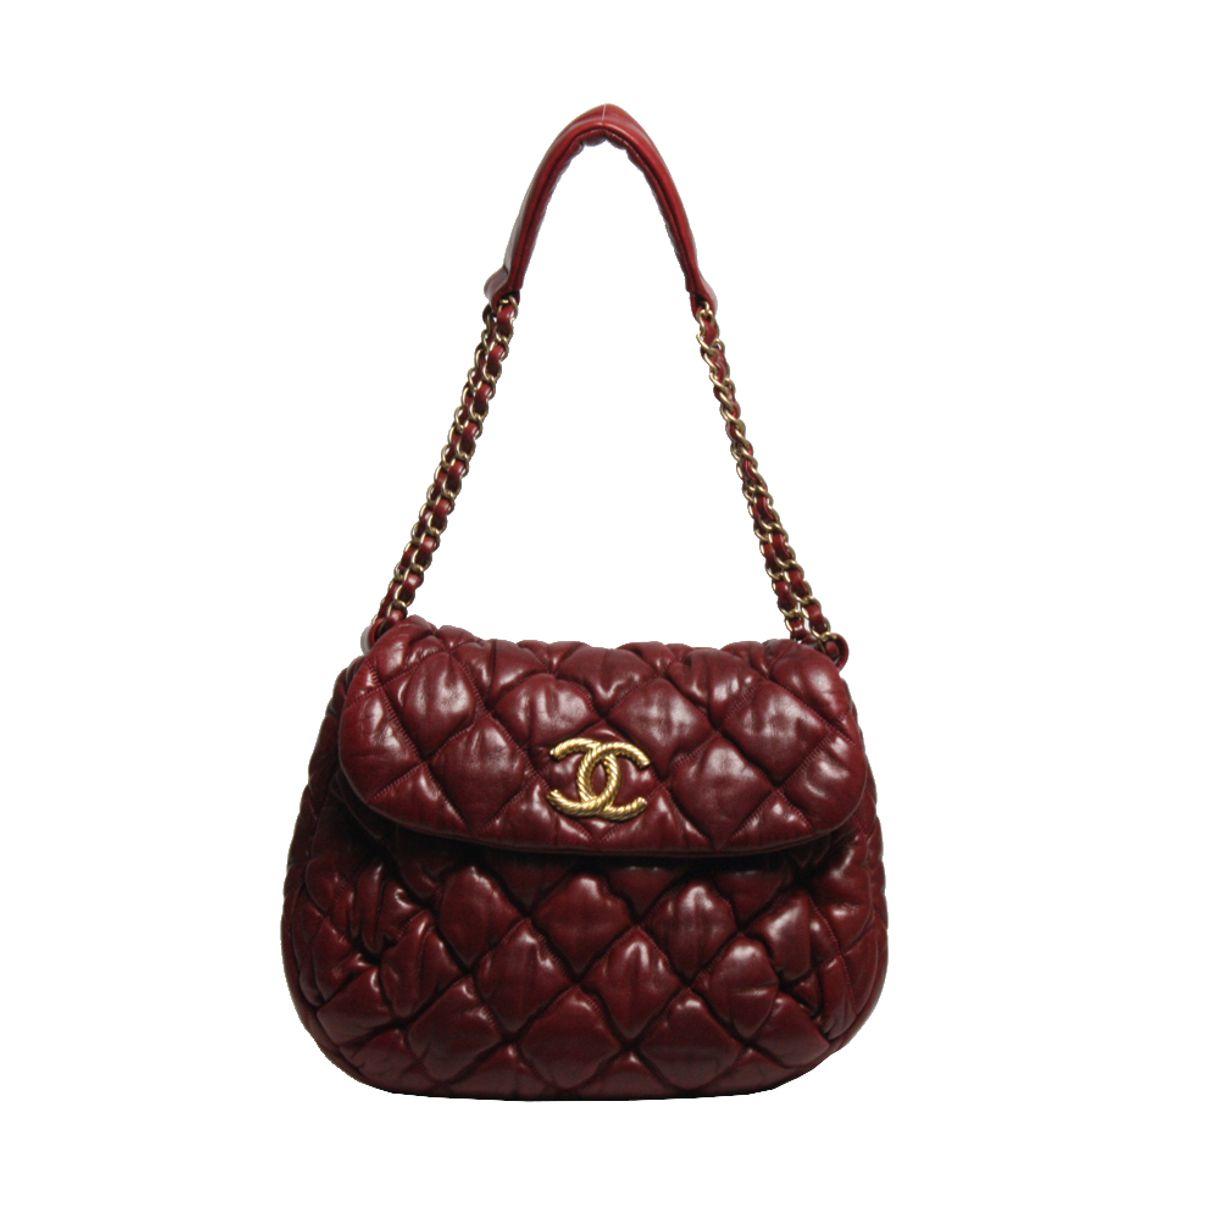 Bolsa-Chanel-Matelasse-Burgundy